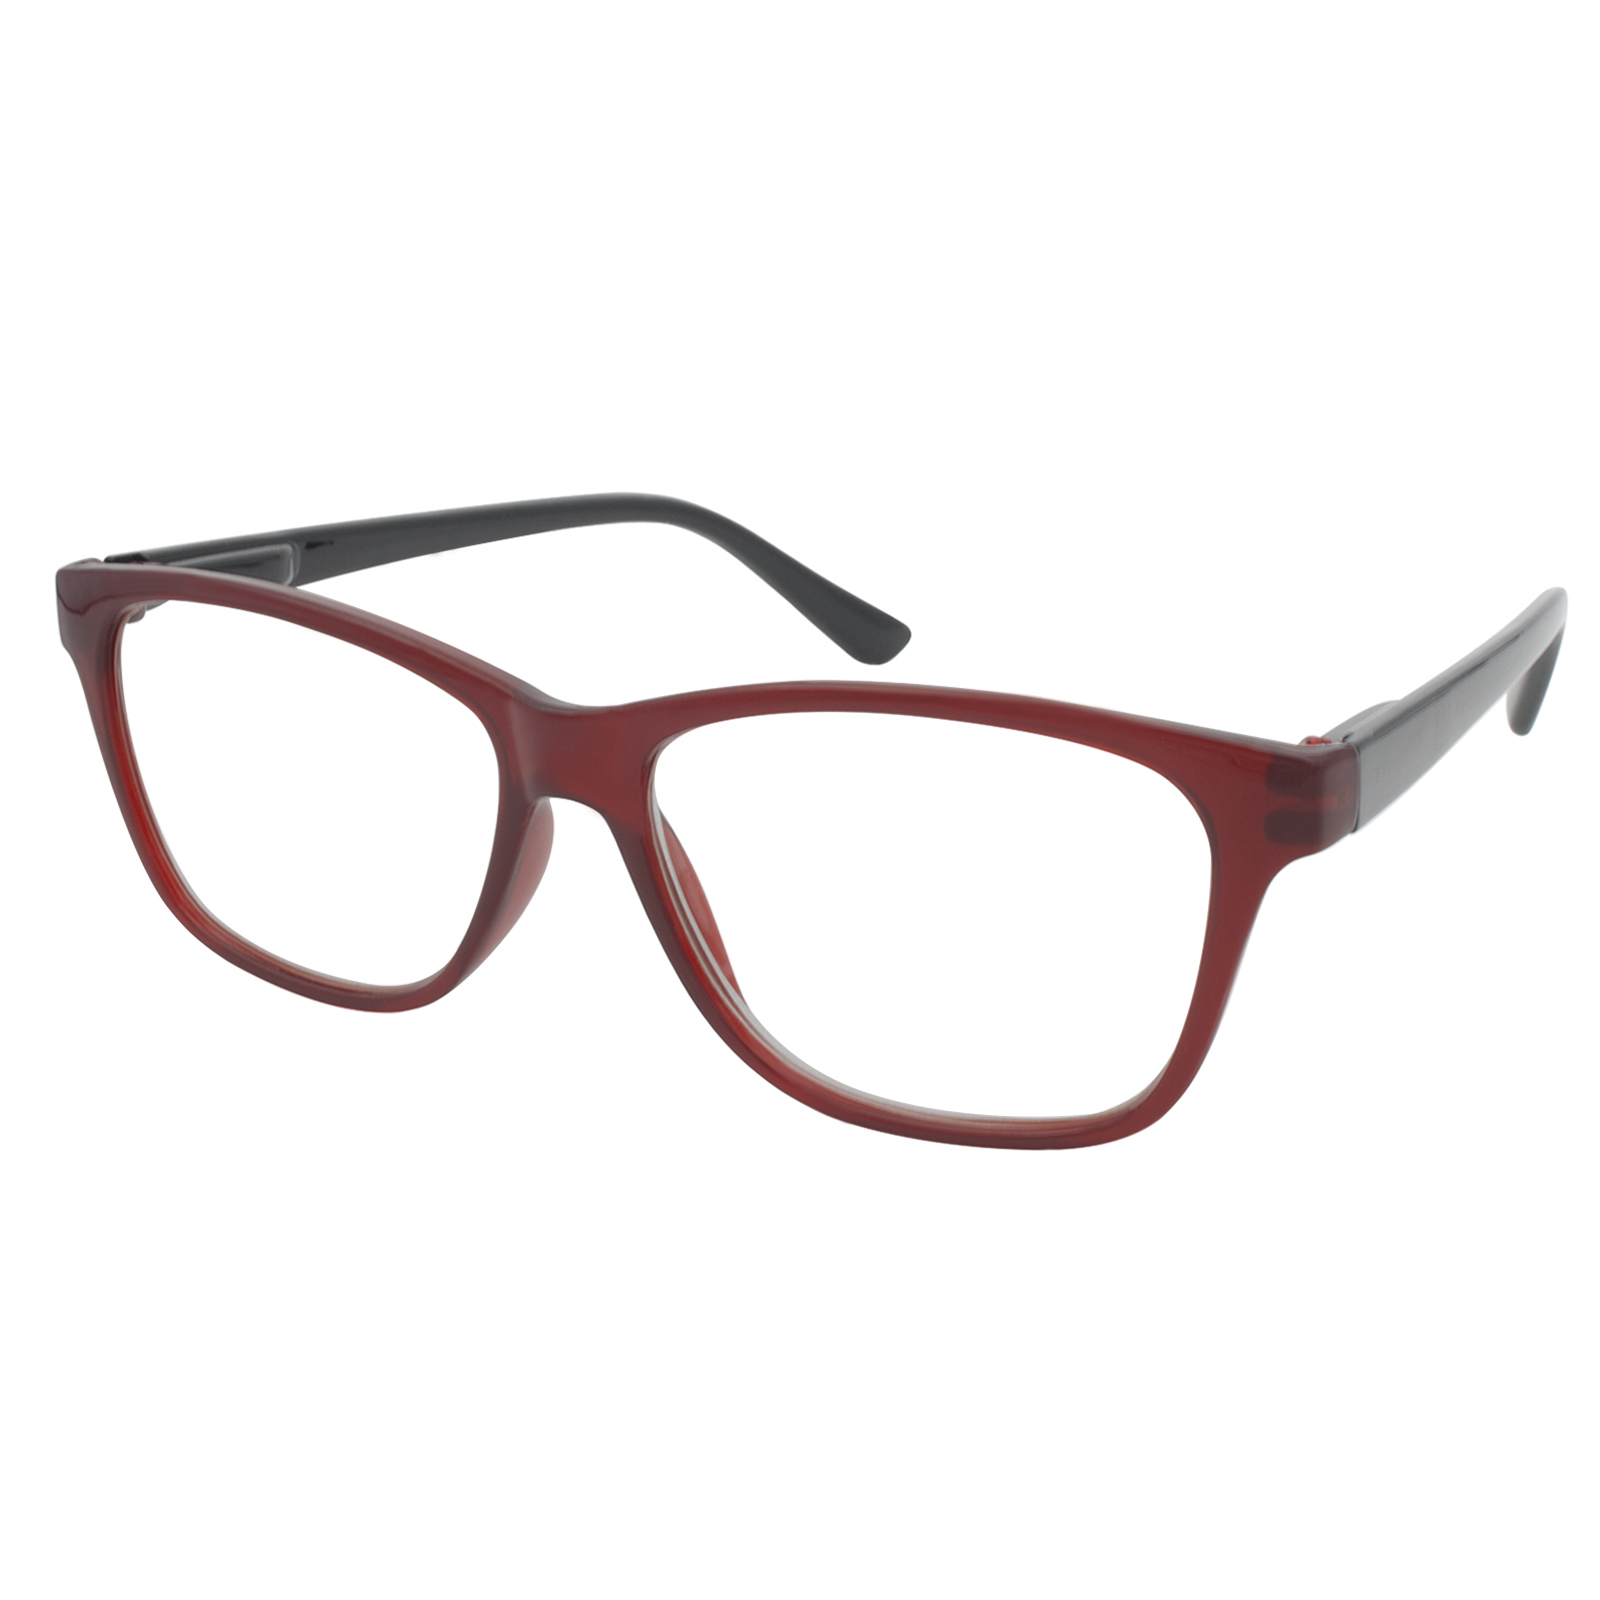 TBOC Presbyopic Reading Eyewear Eyestrain-You Graduates Saddle Fitting Paste Design Design Women's Fashion Lentes Increased Read See Near